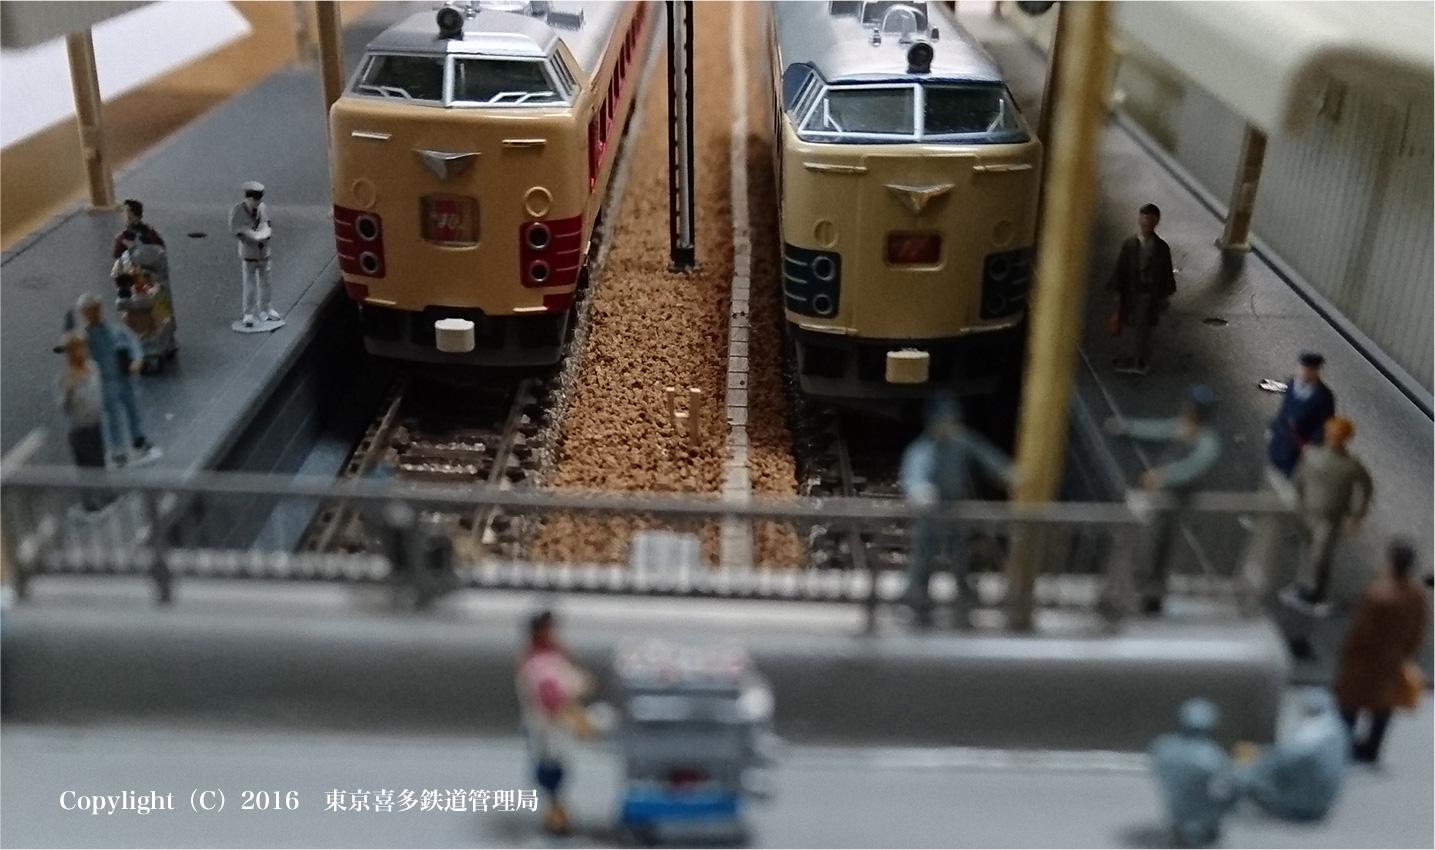 160830_ueno-track20_004.jpg